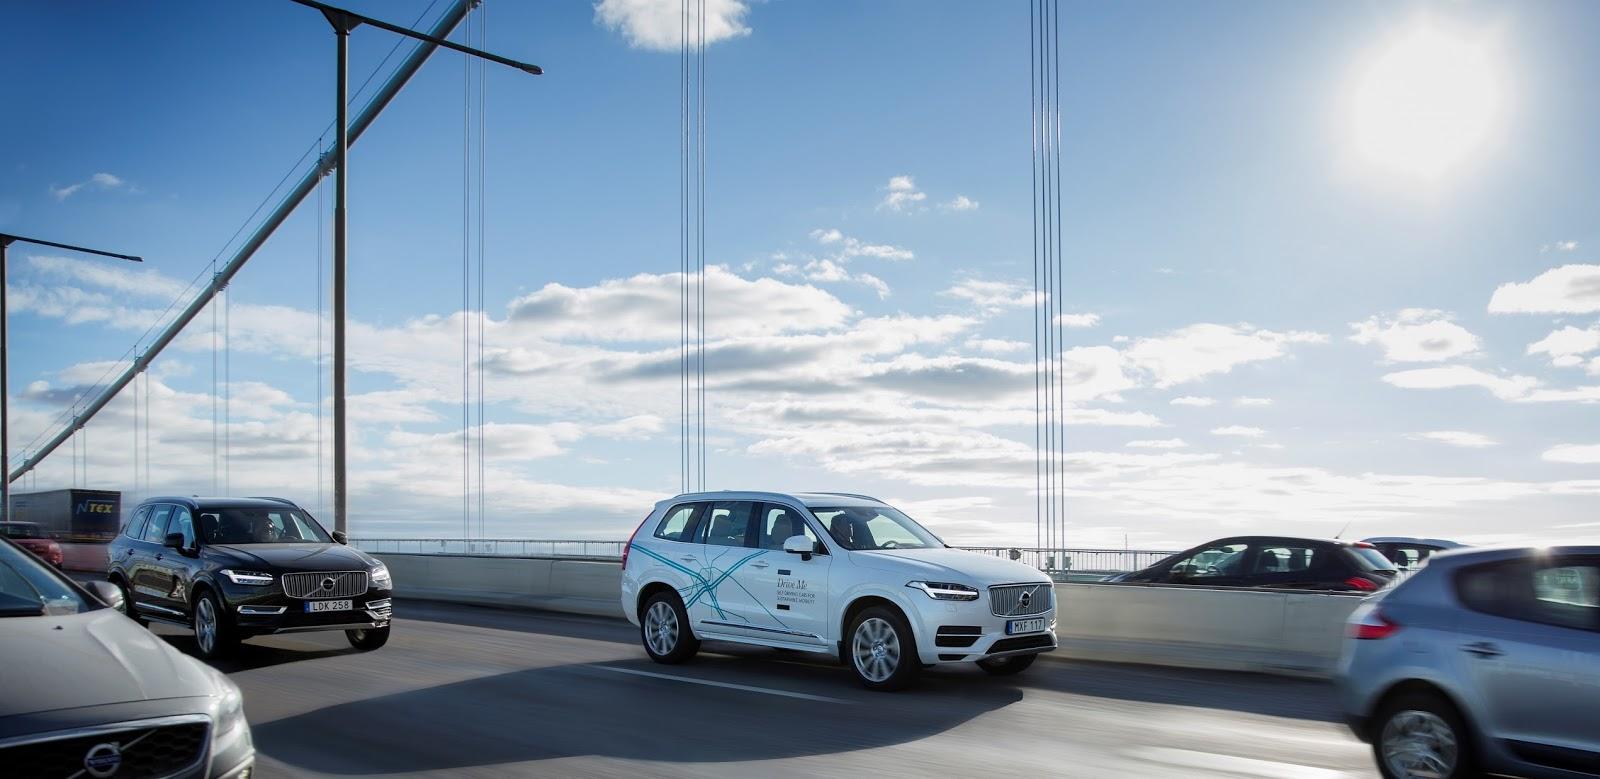 VOLVO DRIVE ME2BLONDON 2 Αυτόνομη οδήγηση από τη Volvo και στη Μεγ. Βρετανία Autonomous Driving, videos, Volvo, Volvo Cars, Τεχνολογία